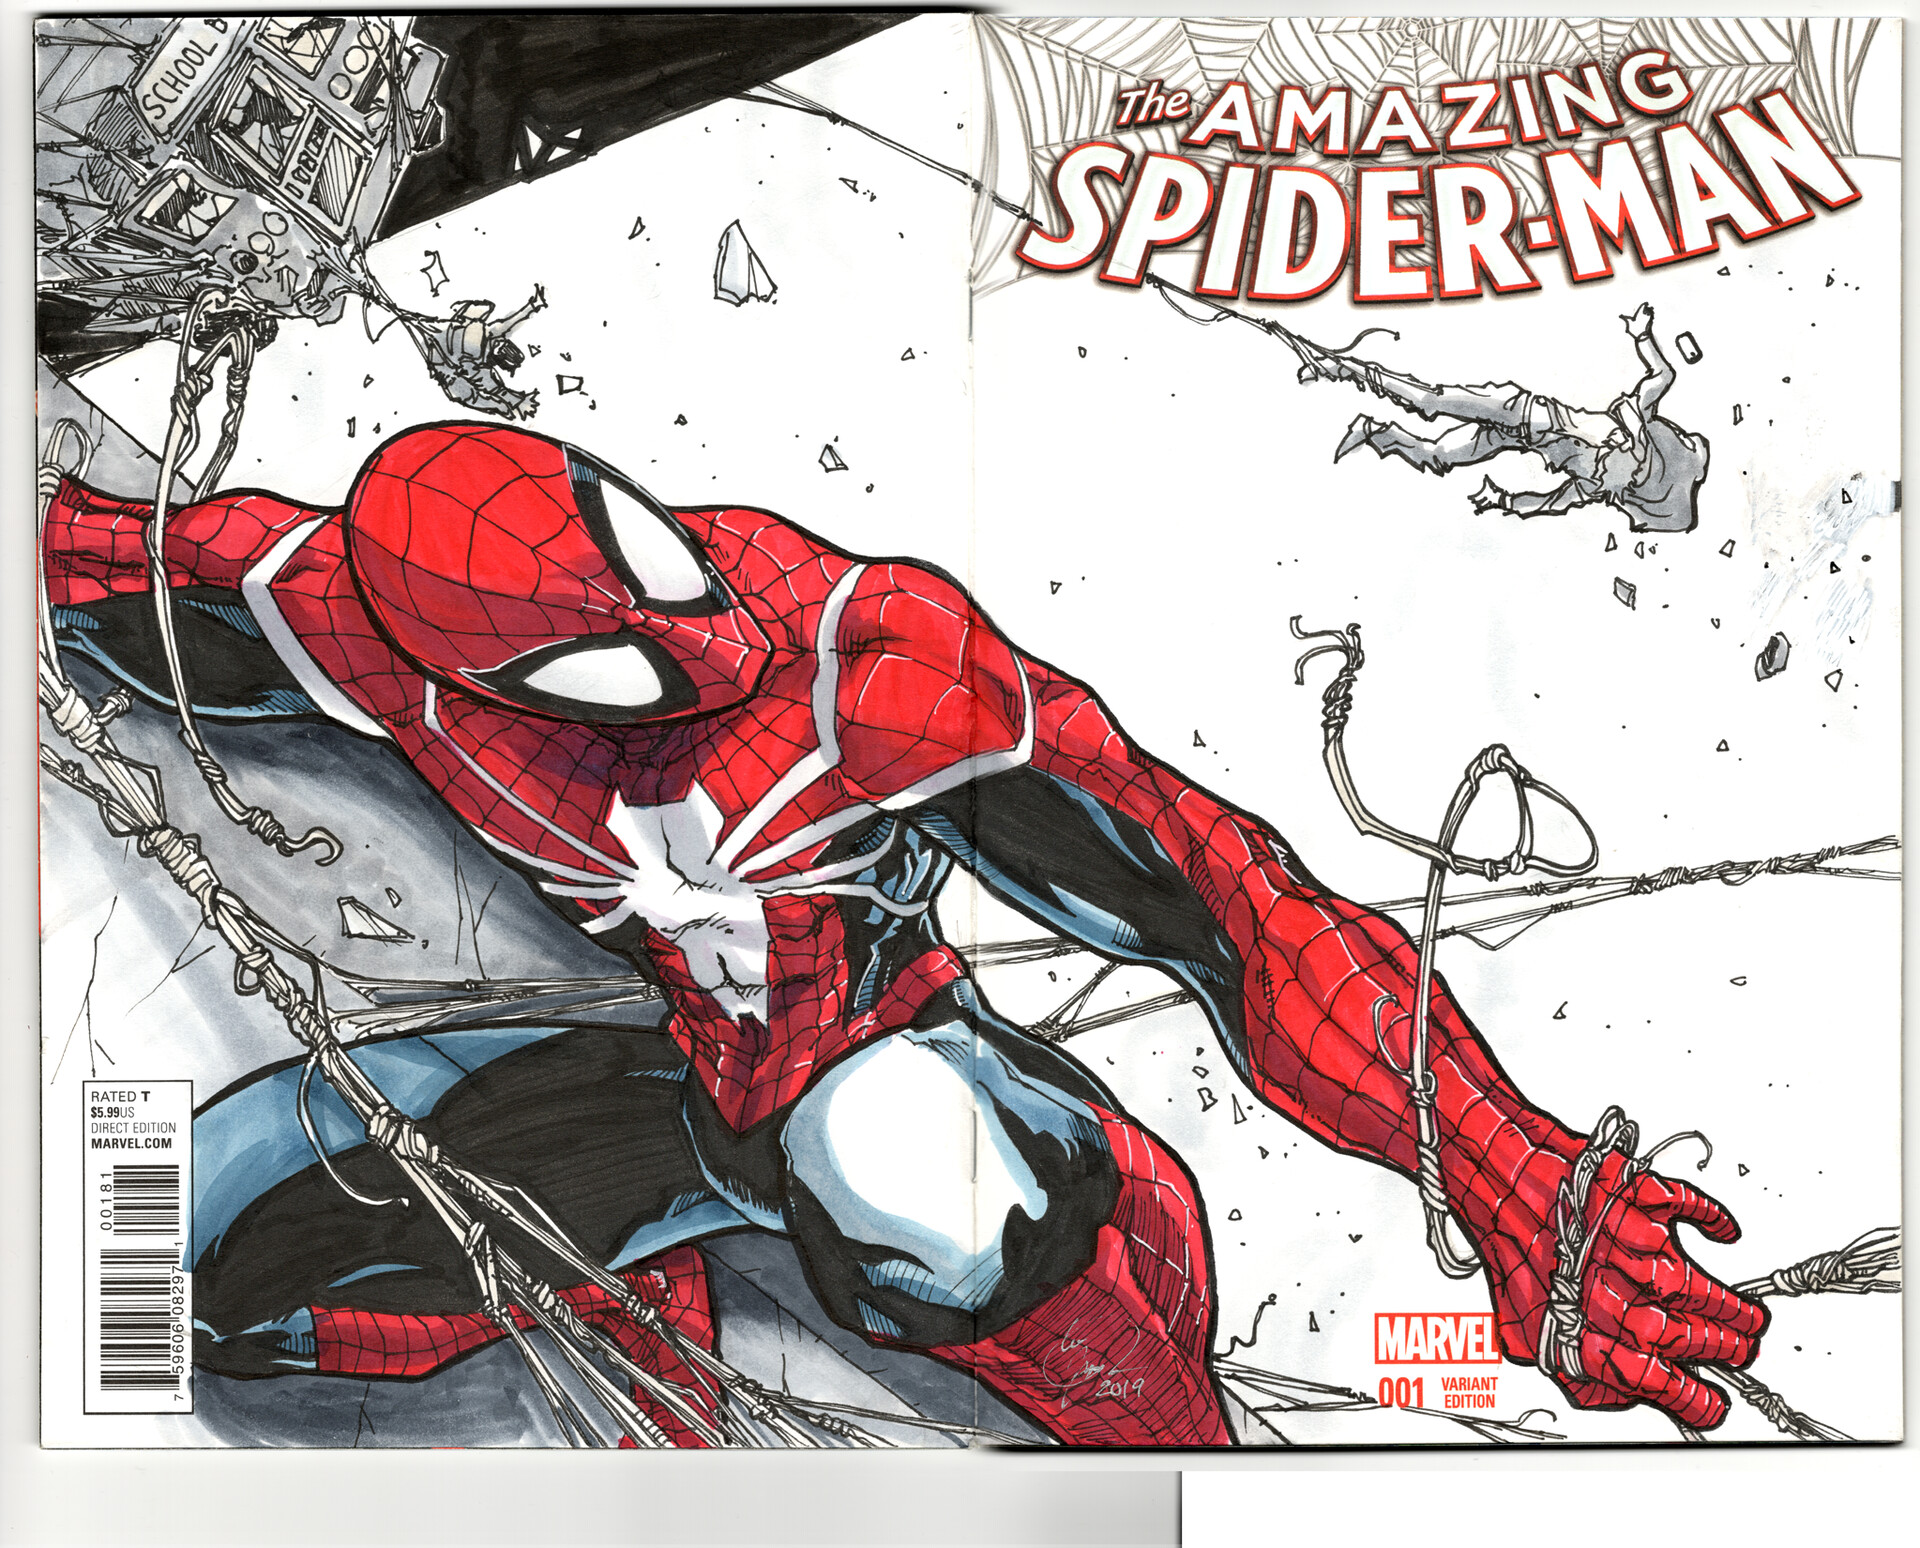 Loc nguyen 2019 04 17 amazing spider man